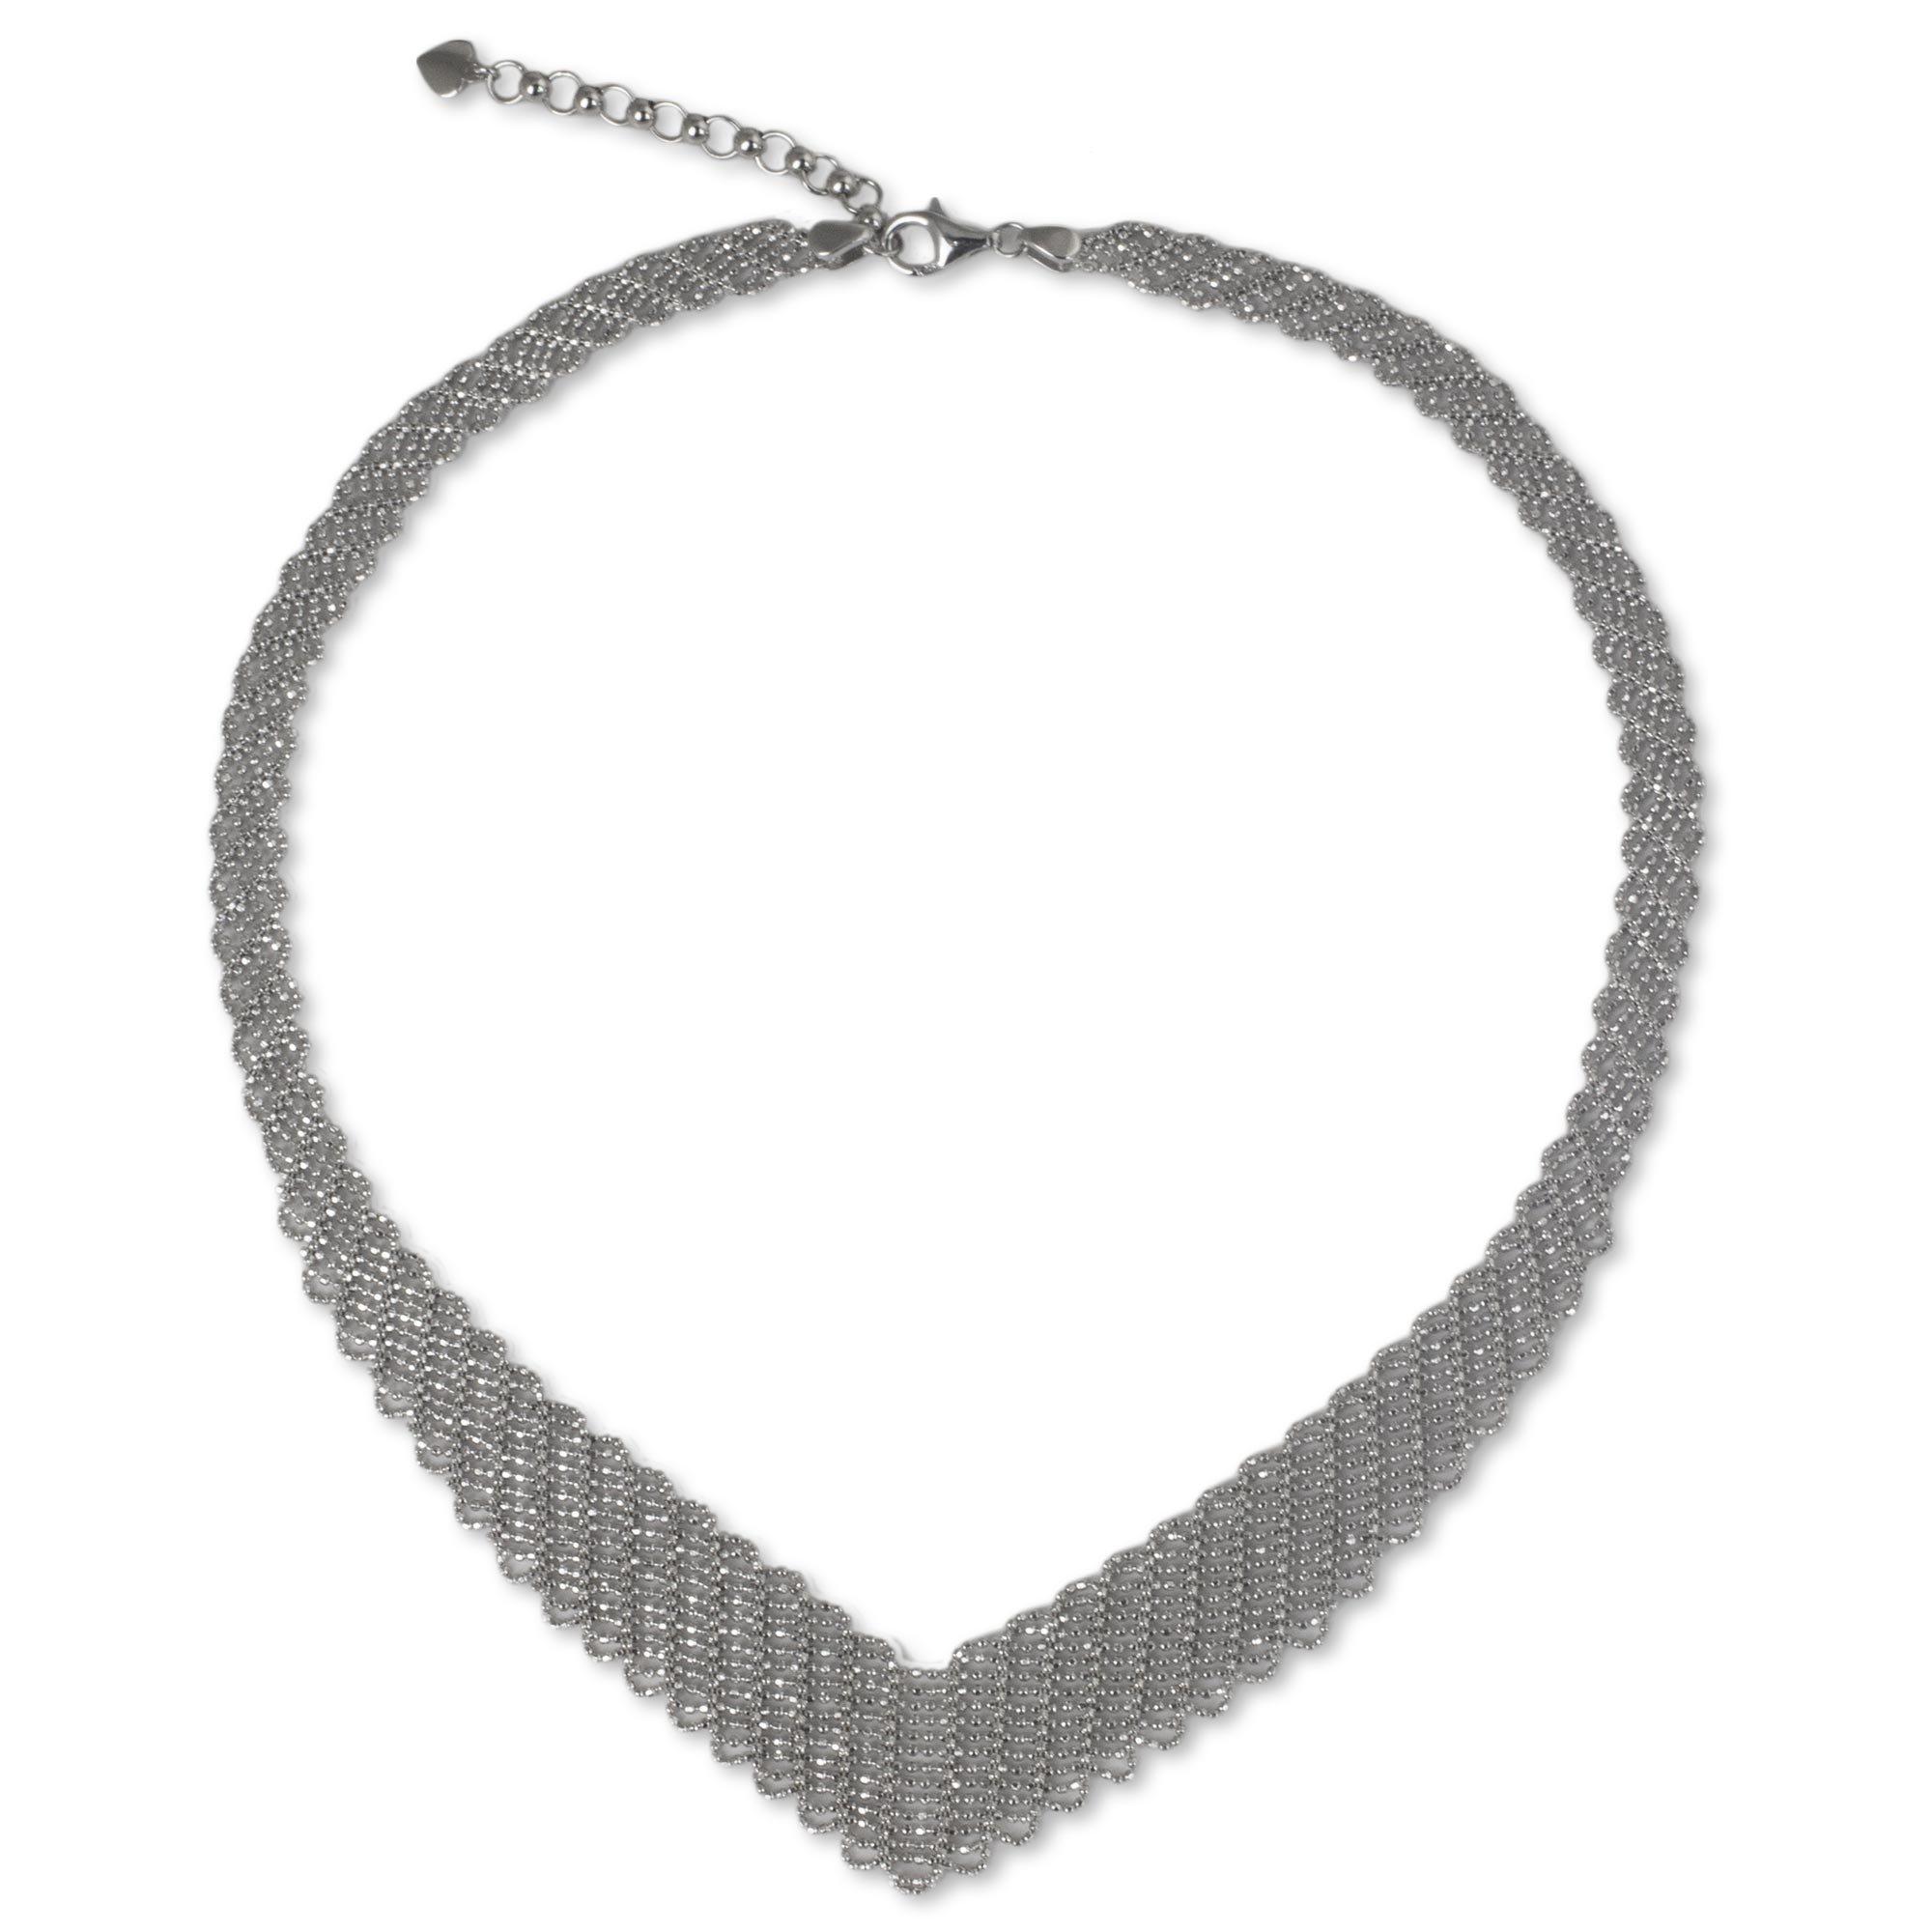 NOVICA .925 Sterling Silver Collar Necklace, 15.75'' 'Precious Weave'